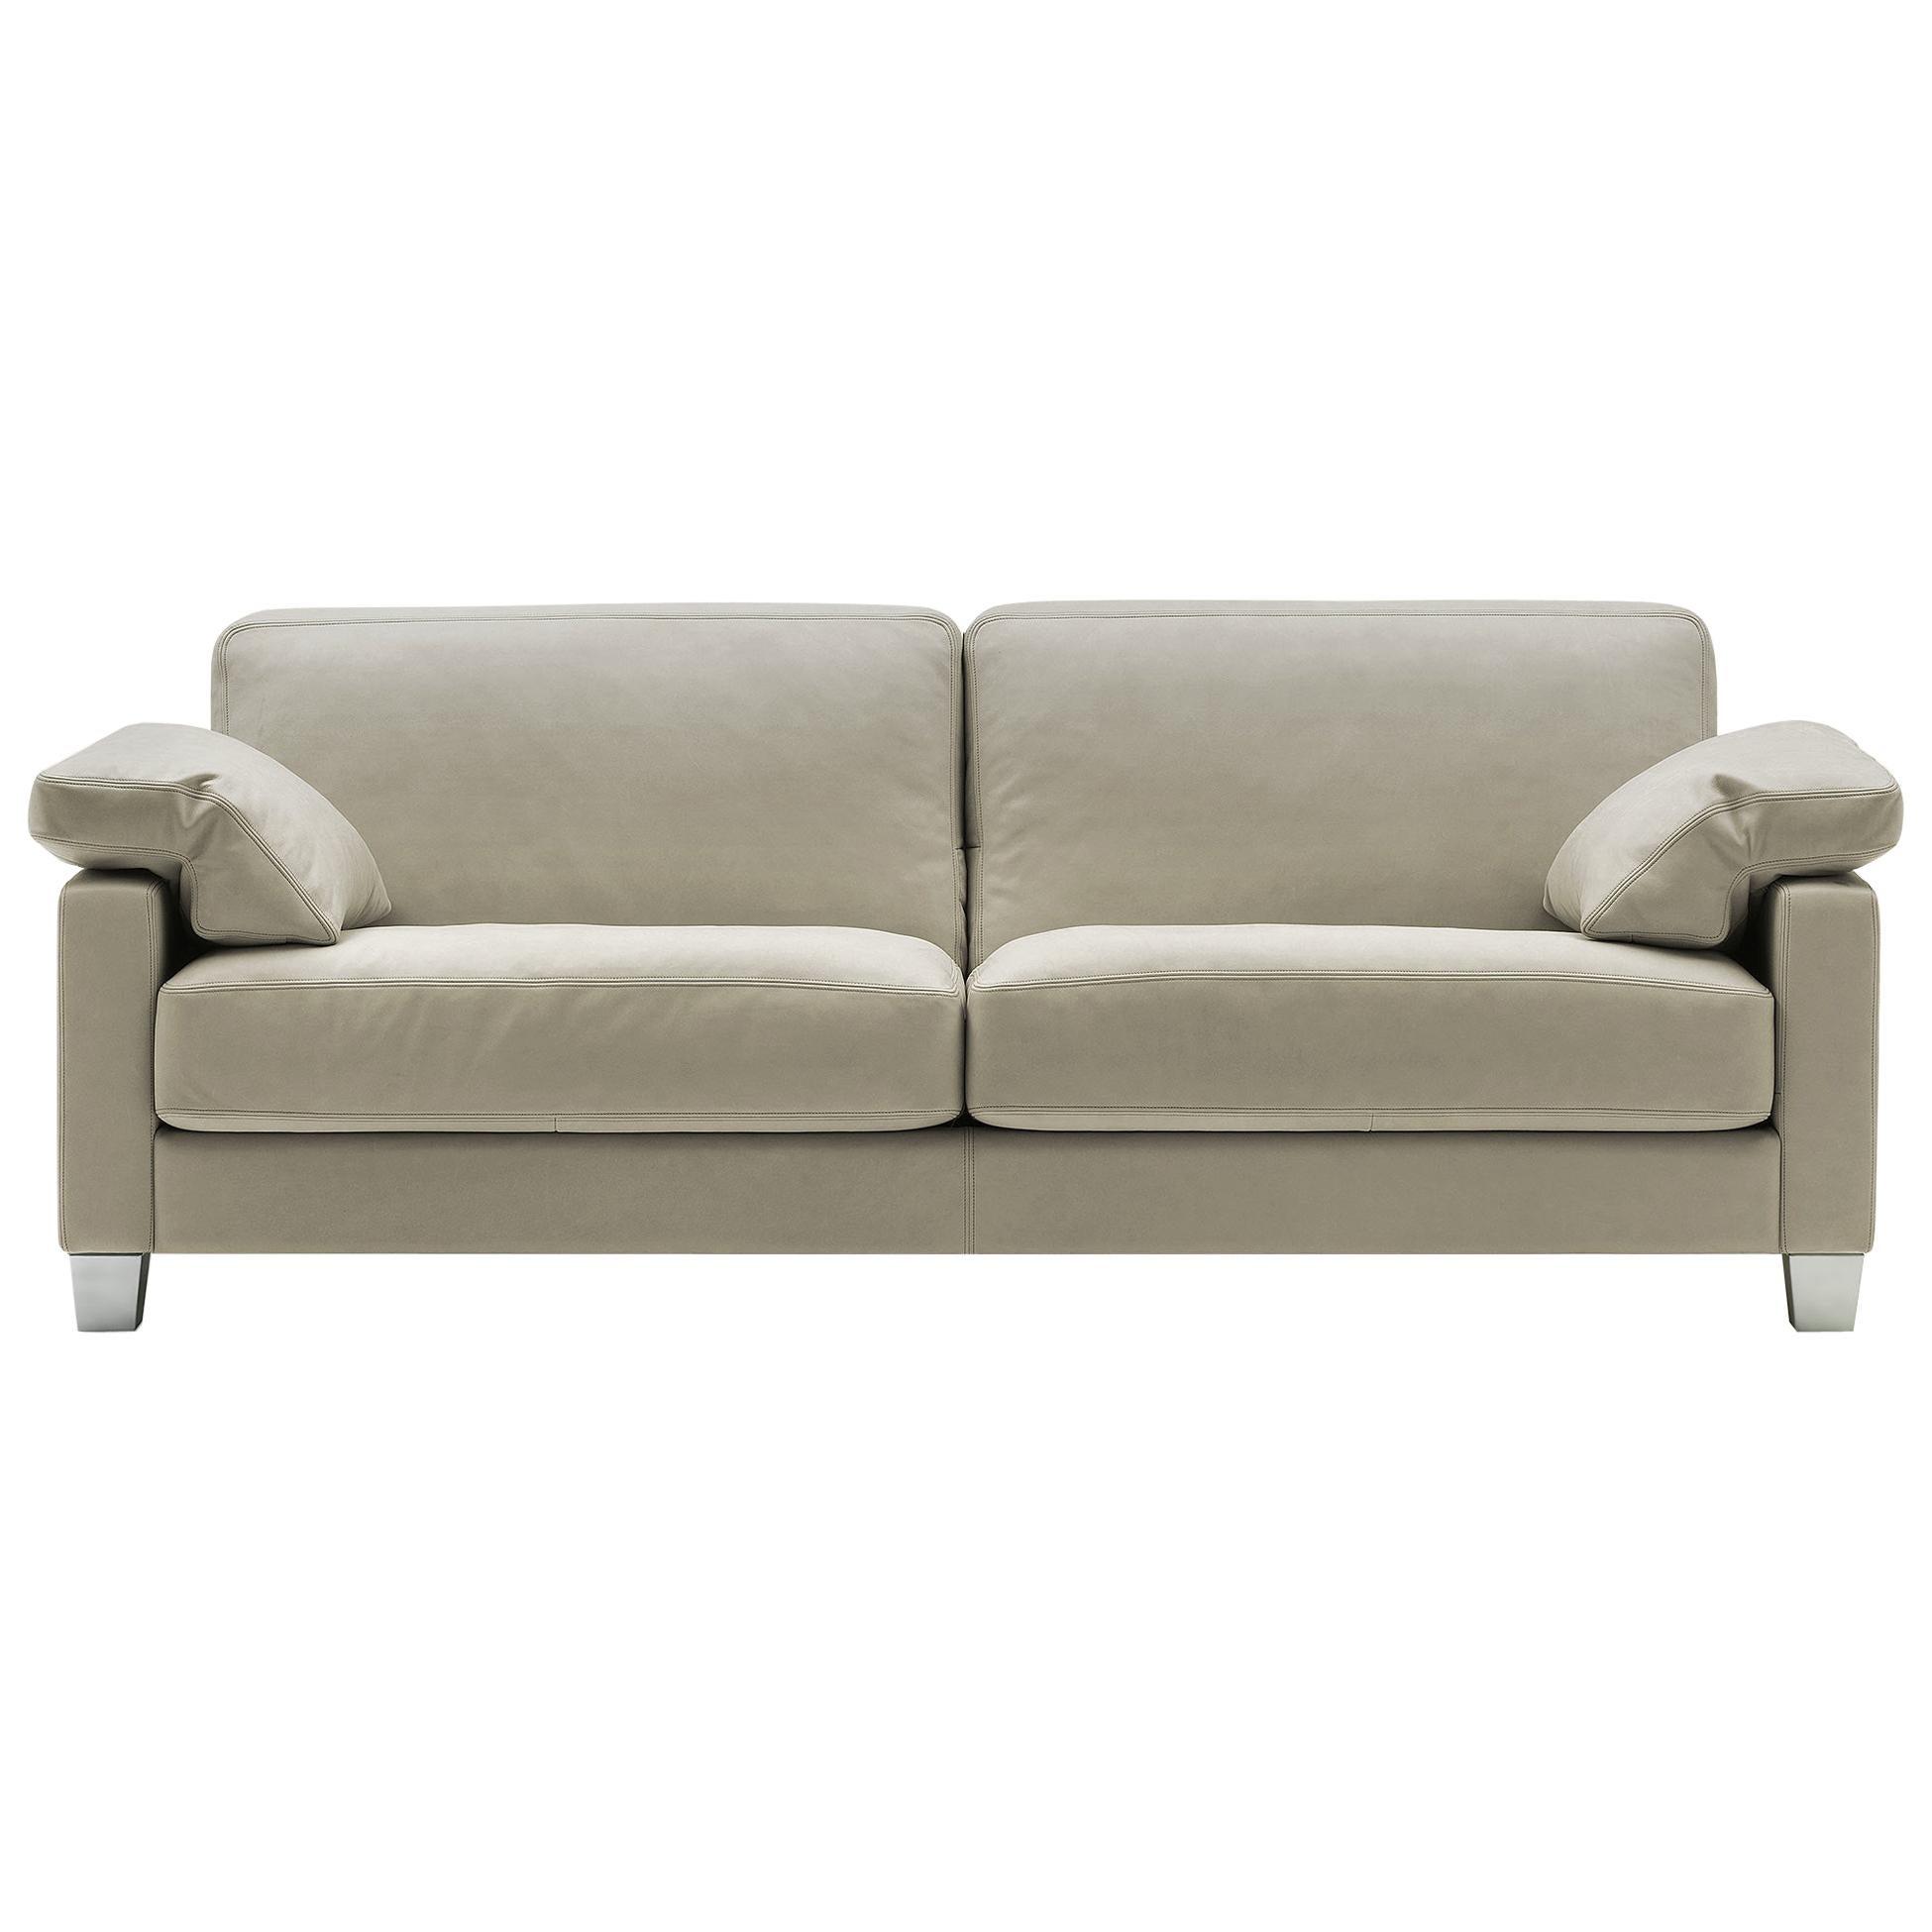 De Sede DS-17 Three-Seat Sofa in Beige Upholstery by Antonella Scarpitta